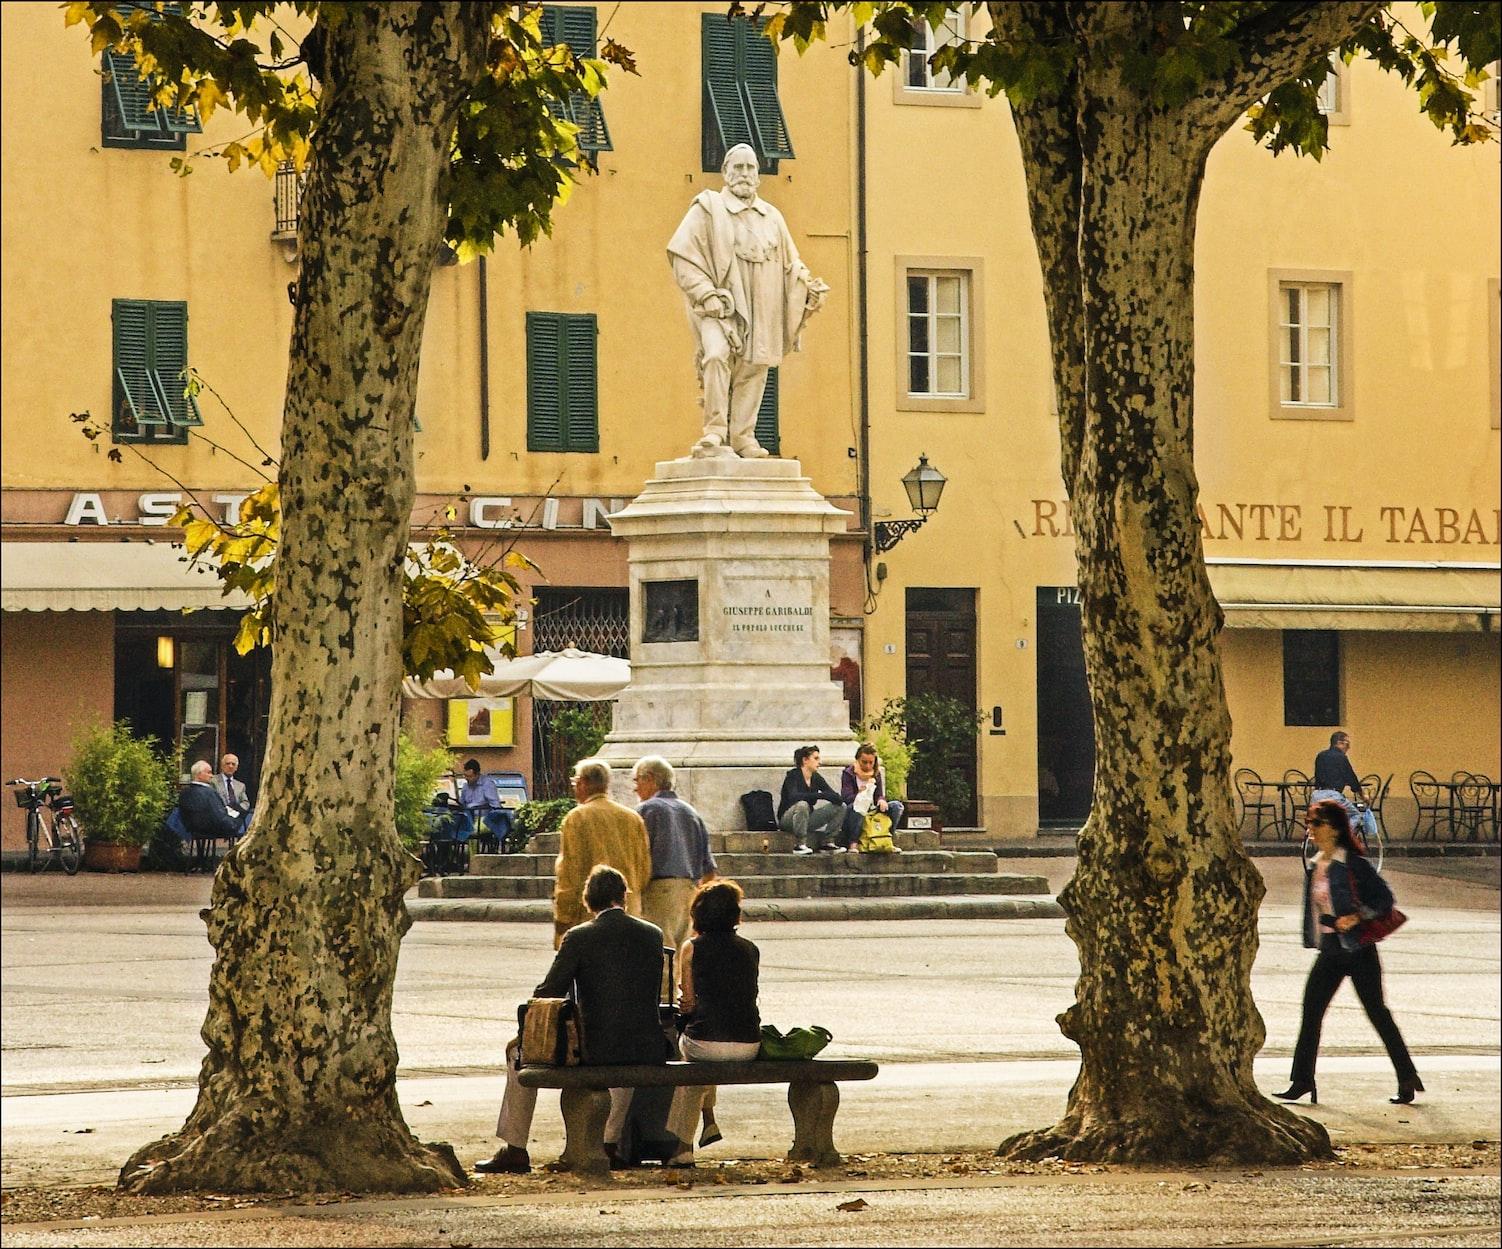 statue in a public square in Lucca, Italy